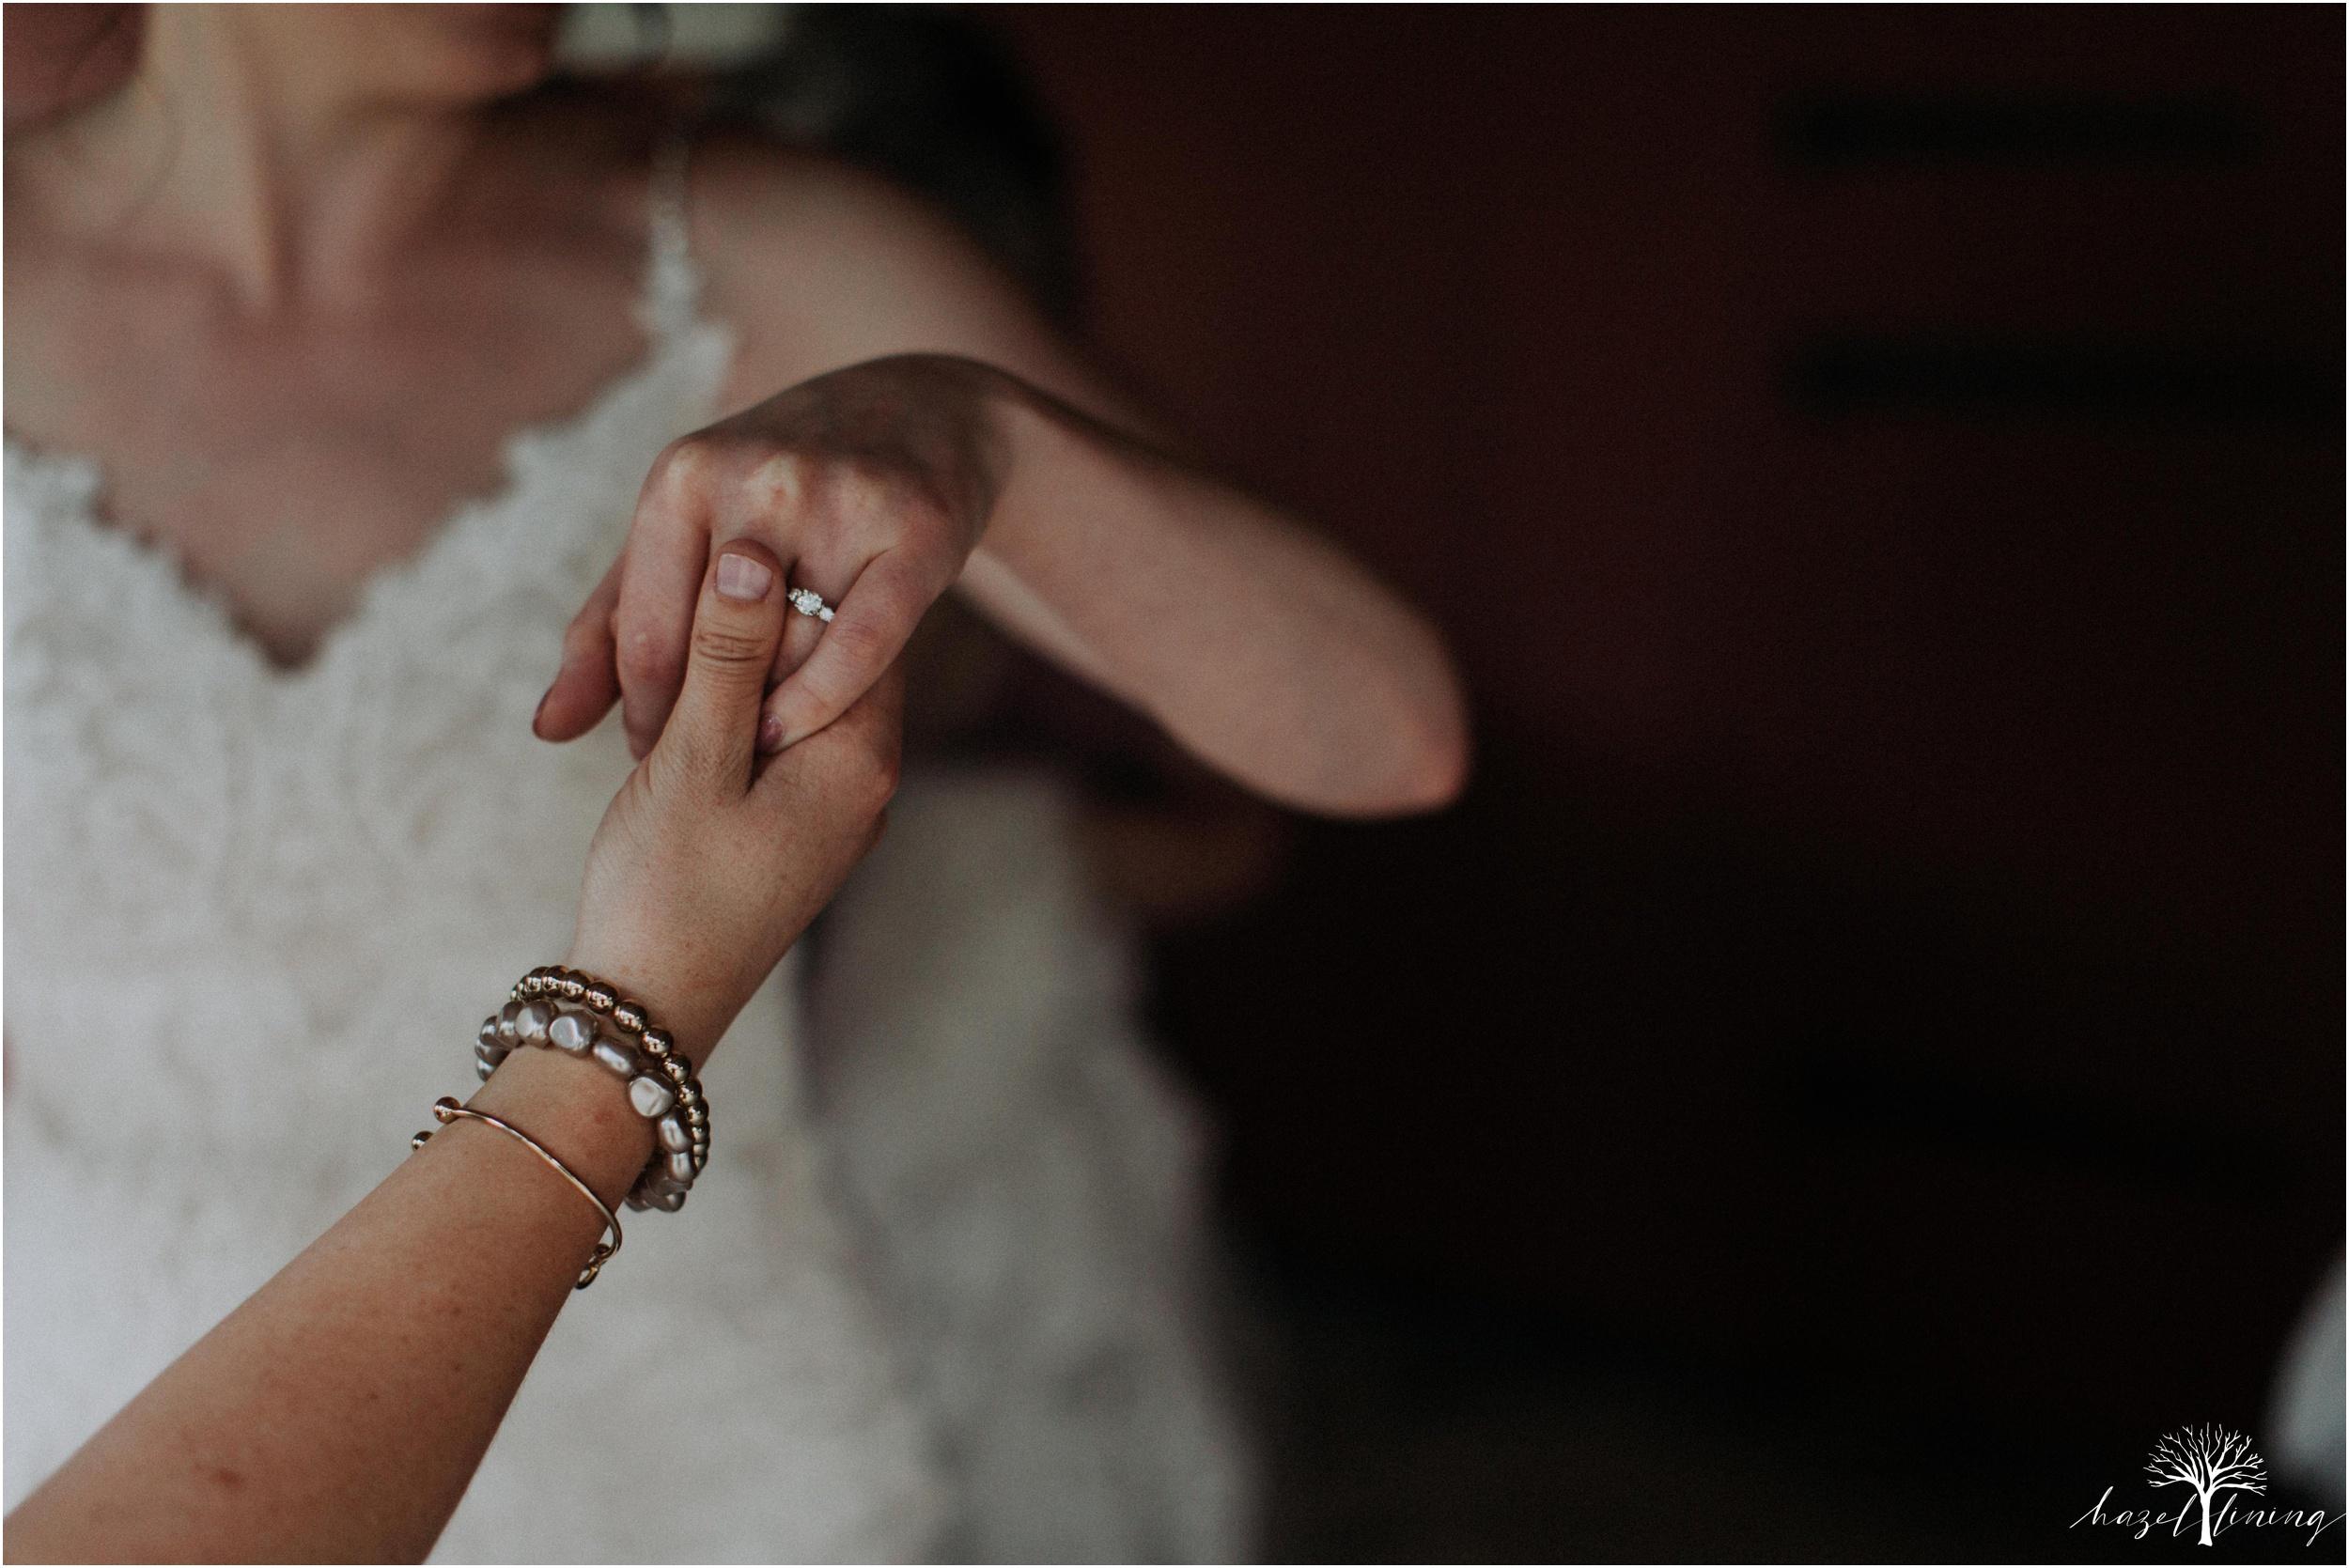 hazel-lining-travel-wedding-elopement-photography-lisa-landon-shoemaker-the-farm-bakery-and-events-bucks-county-quakertown-pennsylvania-summer-country-outdoor-farm-wedding_0011.jpg